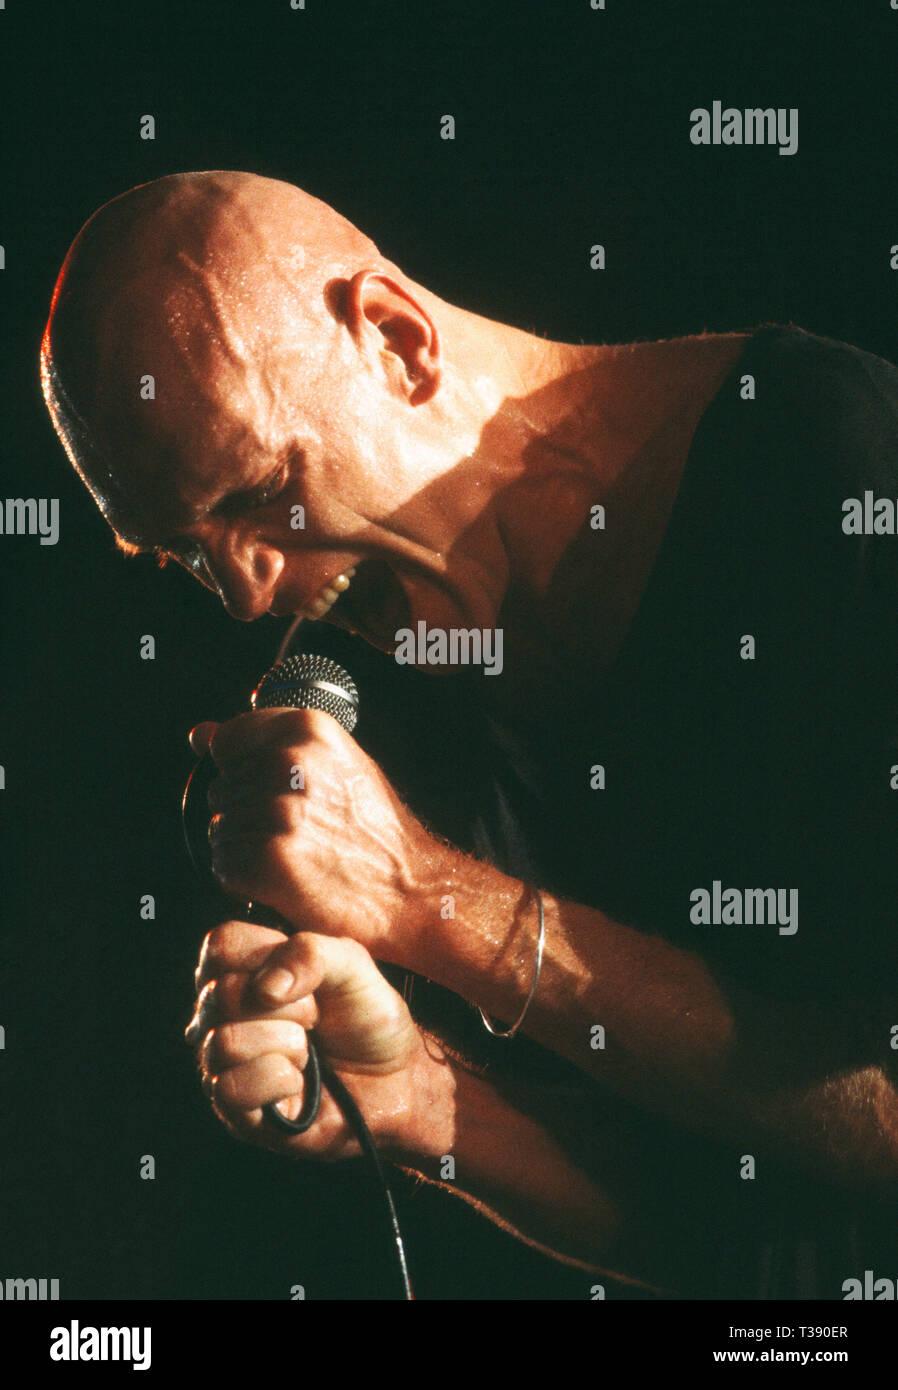 Celebrity.  Musician singer. Peter Garrett of Midnight Oil rock band on stage. - Stock Image